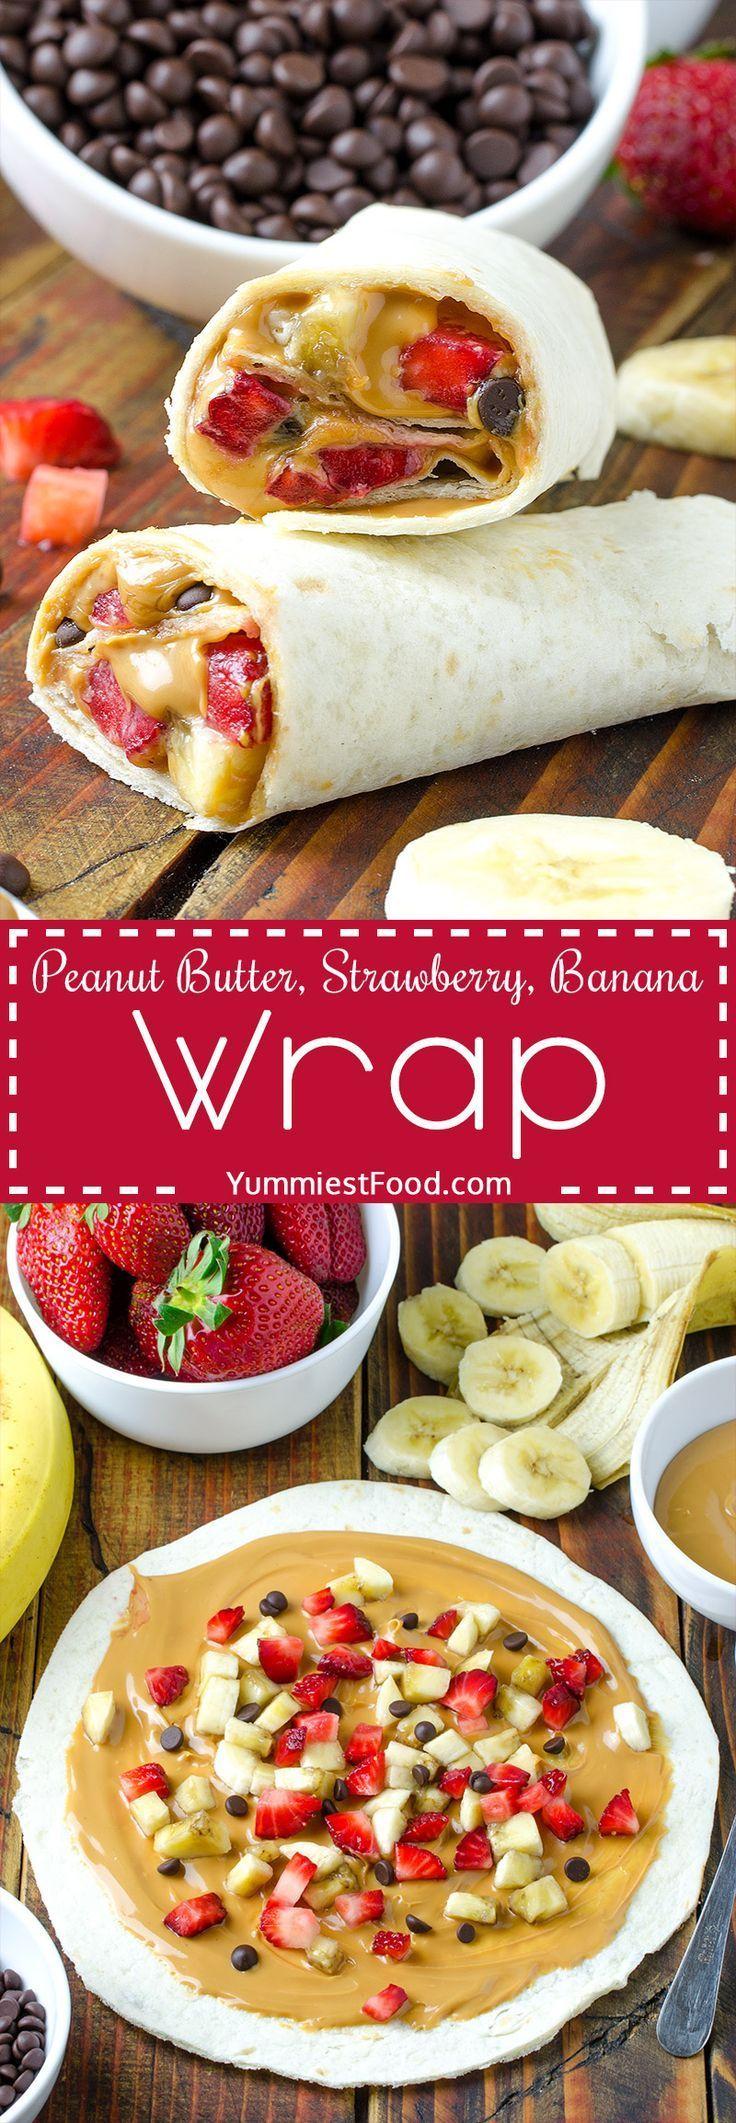 Healthy Peanut Butter, Strawberry, Banana Wrap #healthysnacks